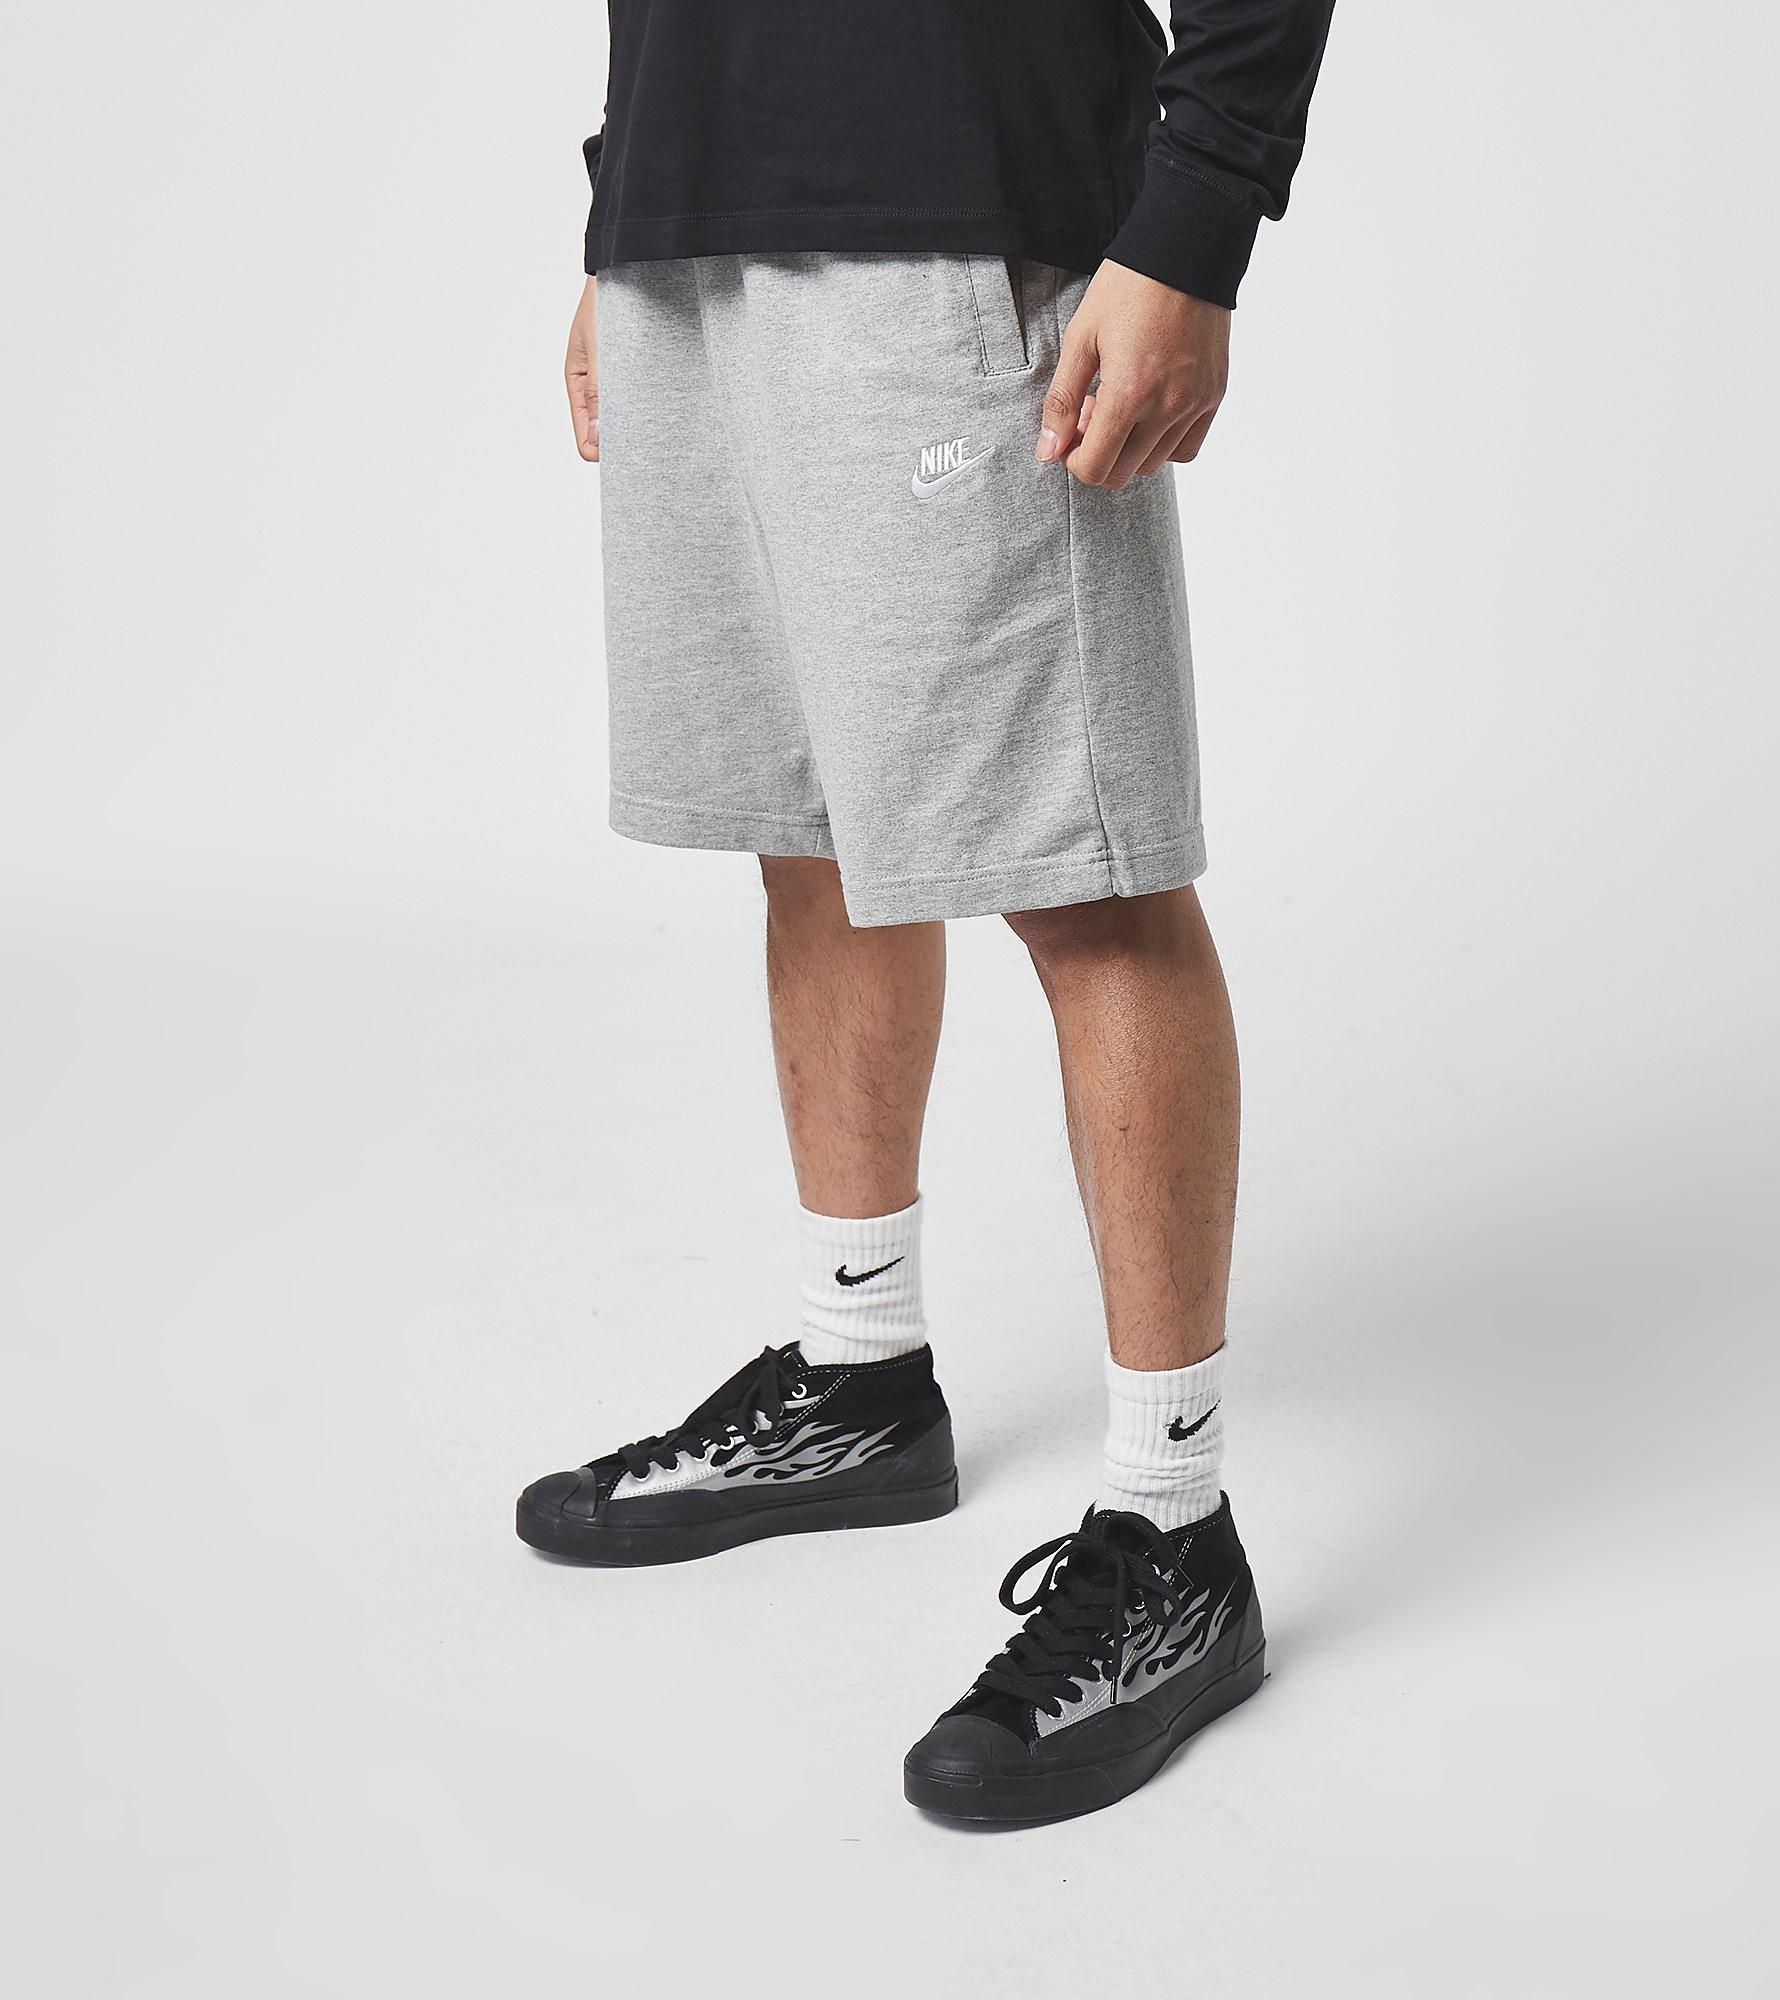 Nike Short Jersey Club